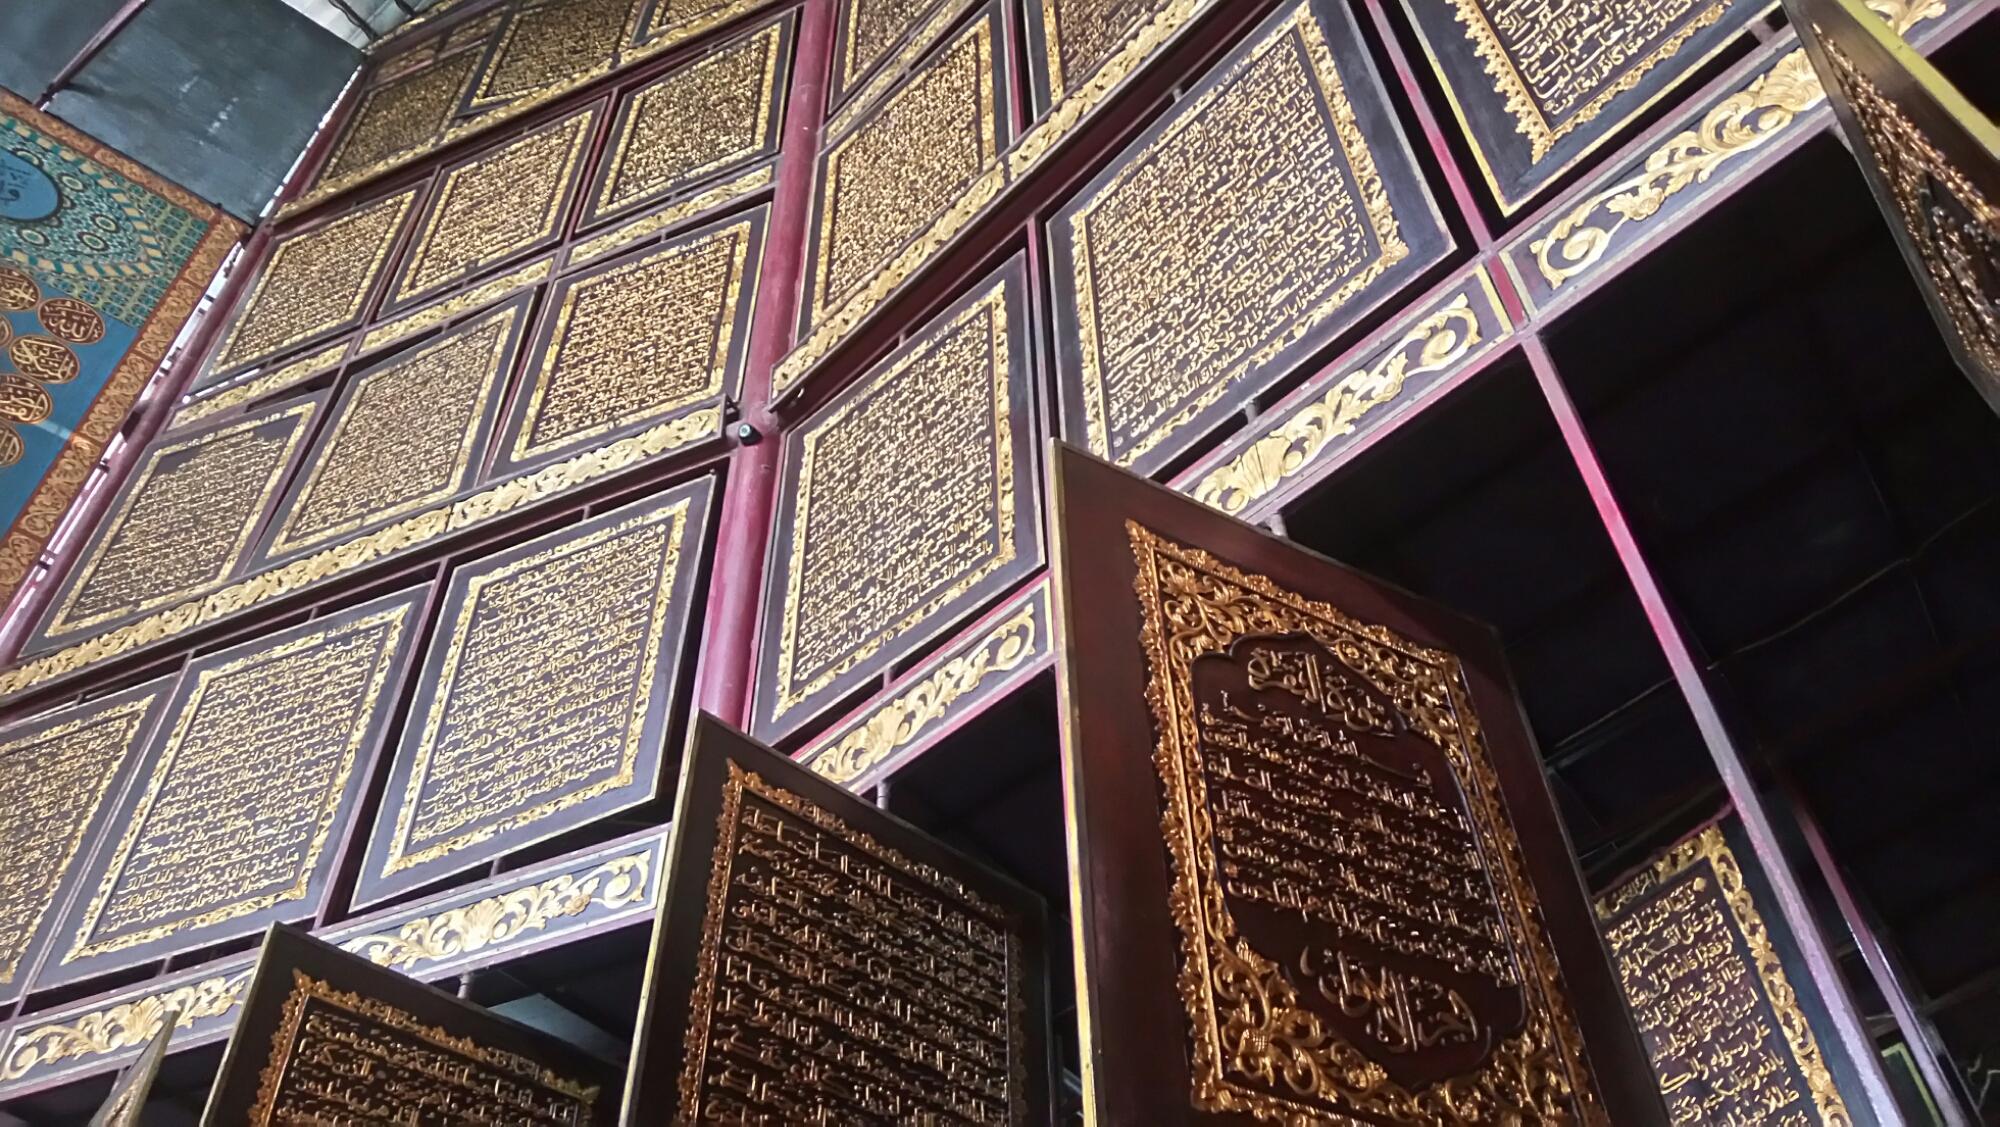 Explore Al Qur Akbar Palembang Almondstruck16 Berjumlah 630 Halaman 315